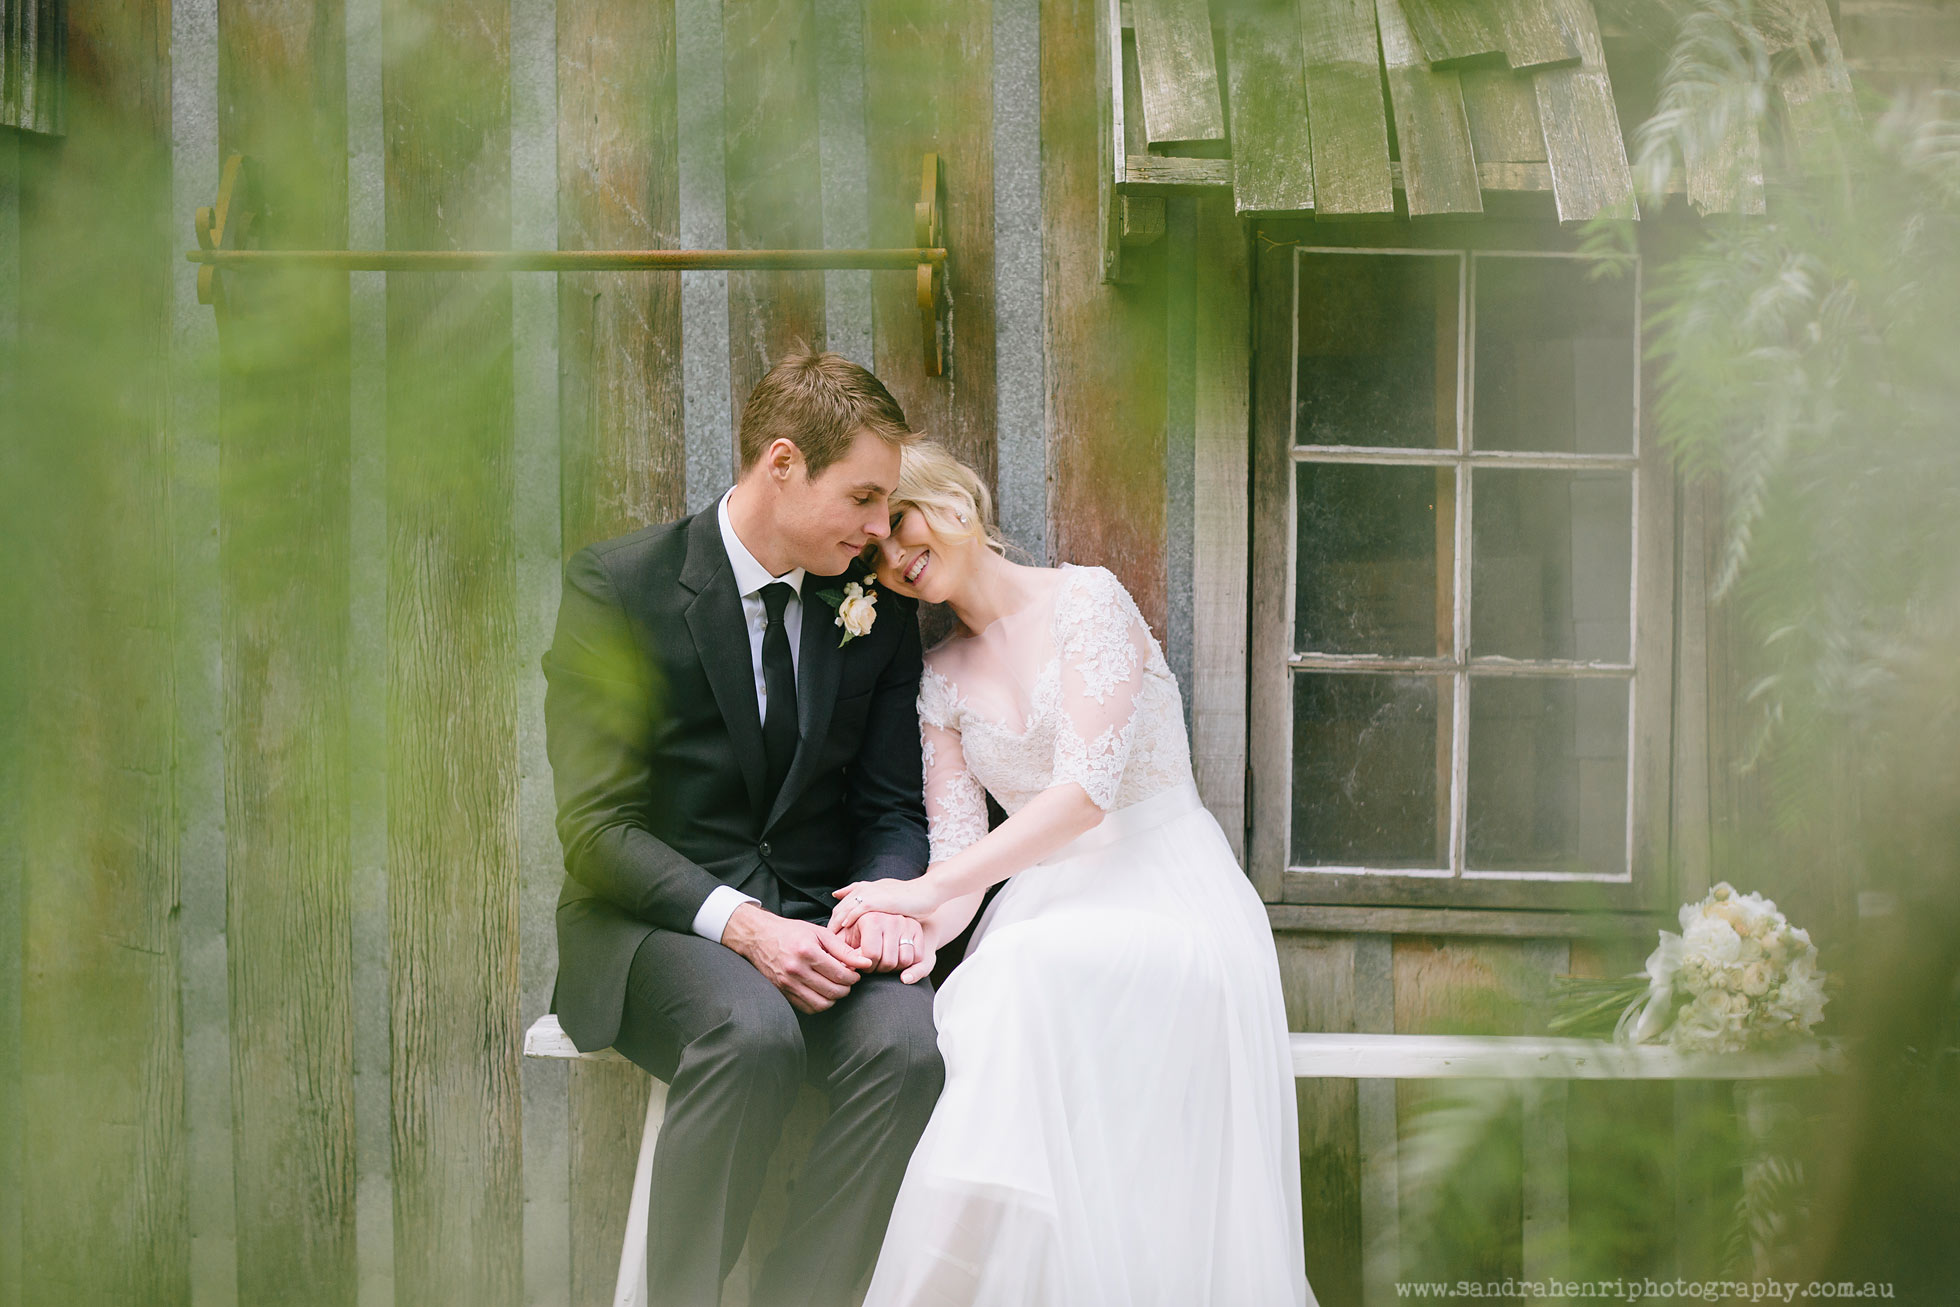 Roberts-Restaurant-garden-wedding-images-29.jpg